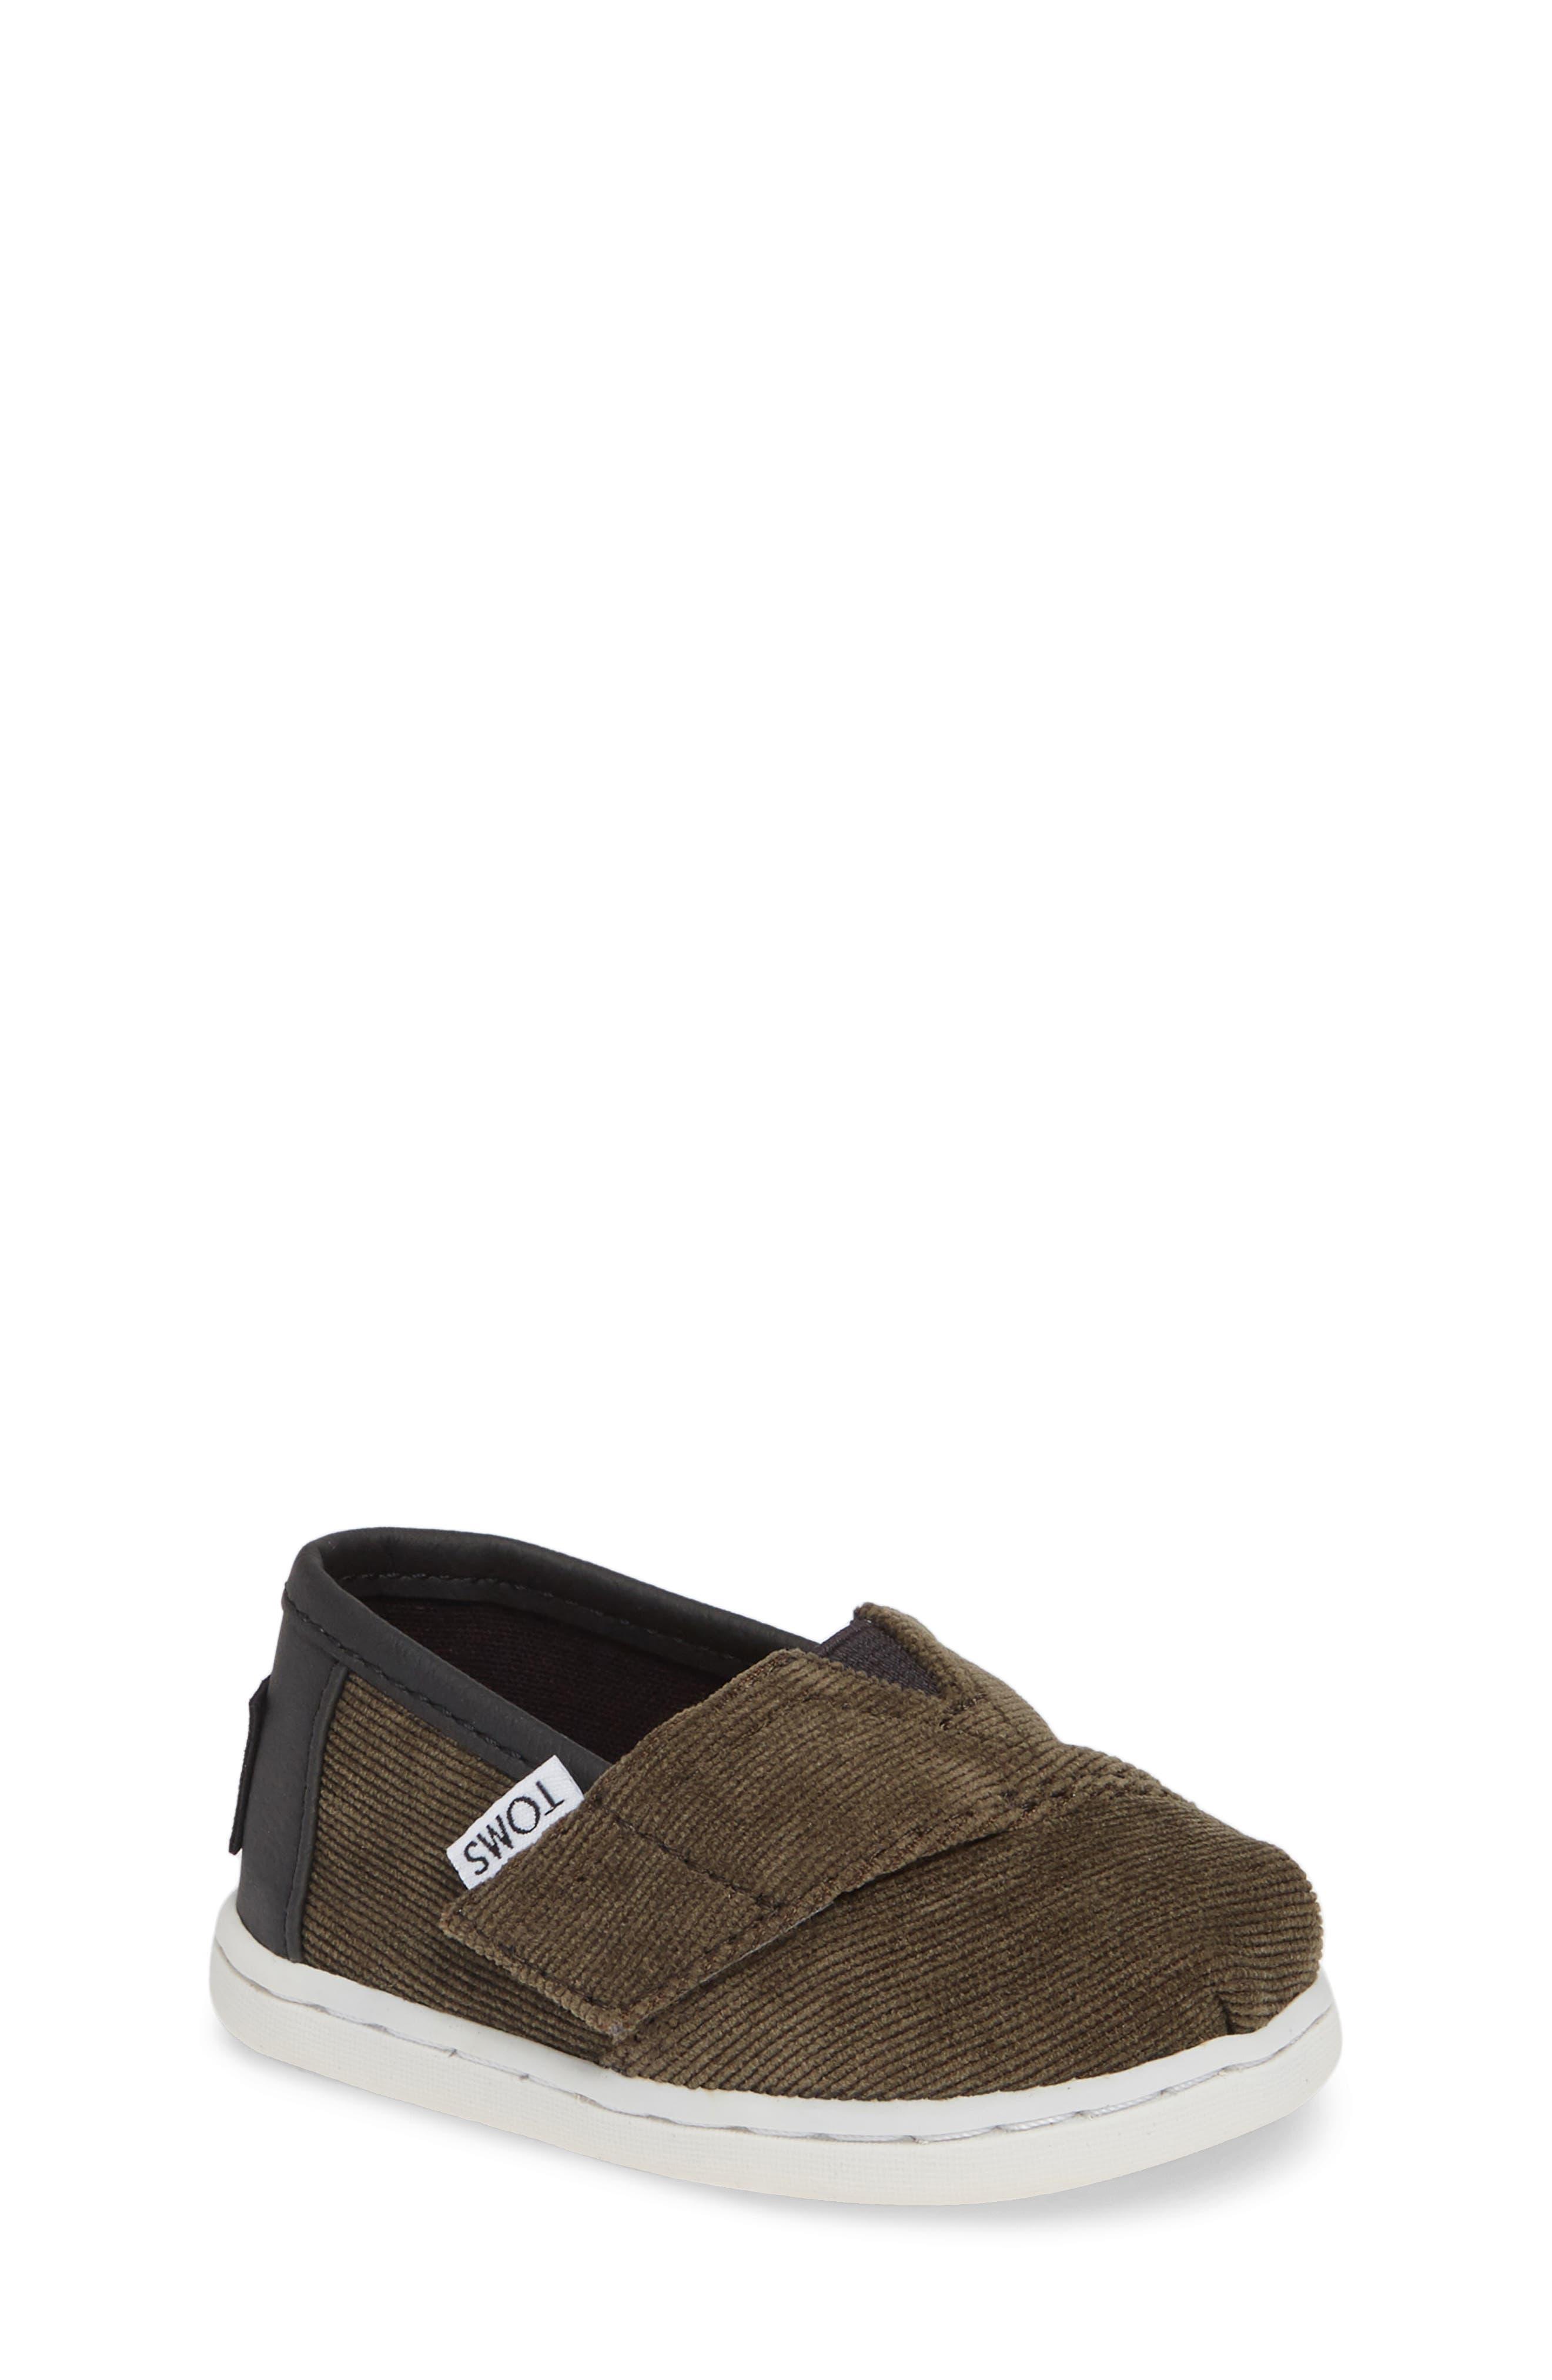 Classic Alpargata Slip-On,                         Main,                         color, Olive Corduroy Leather